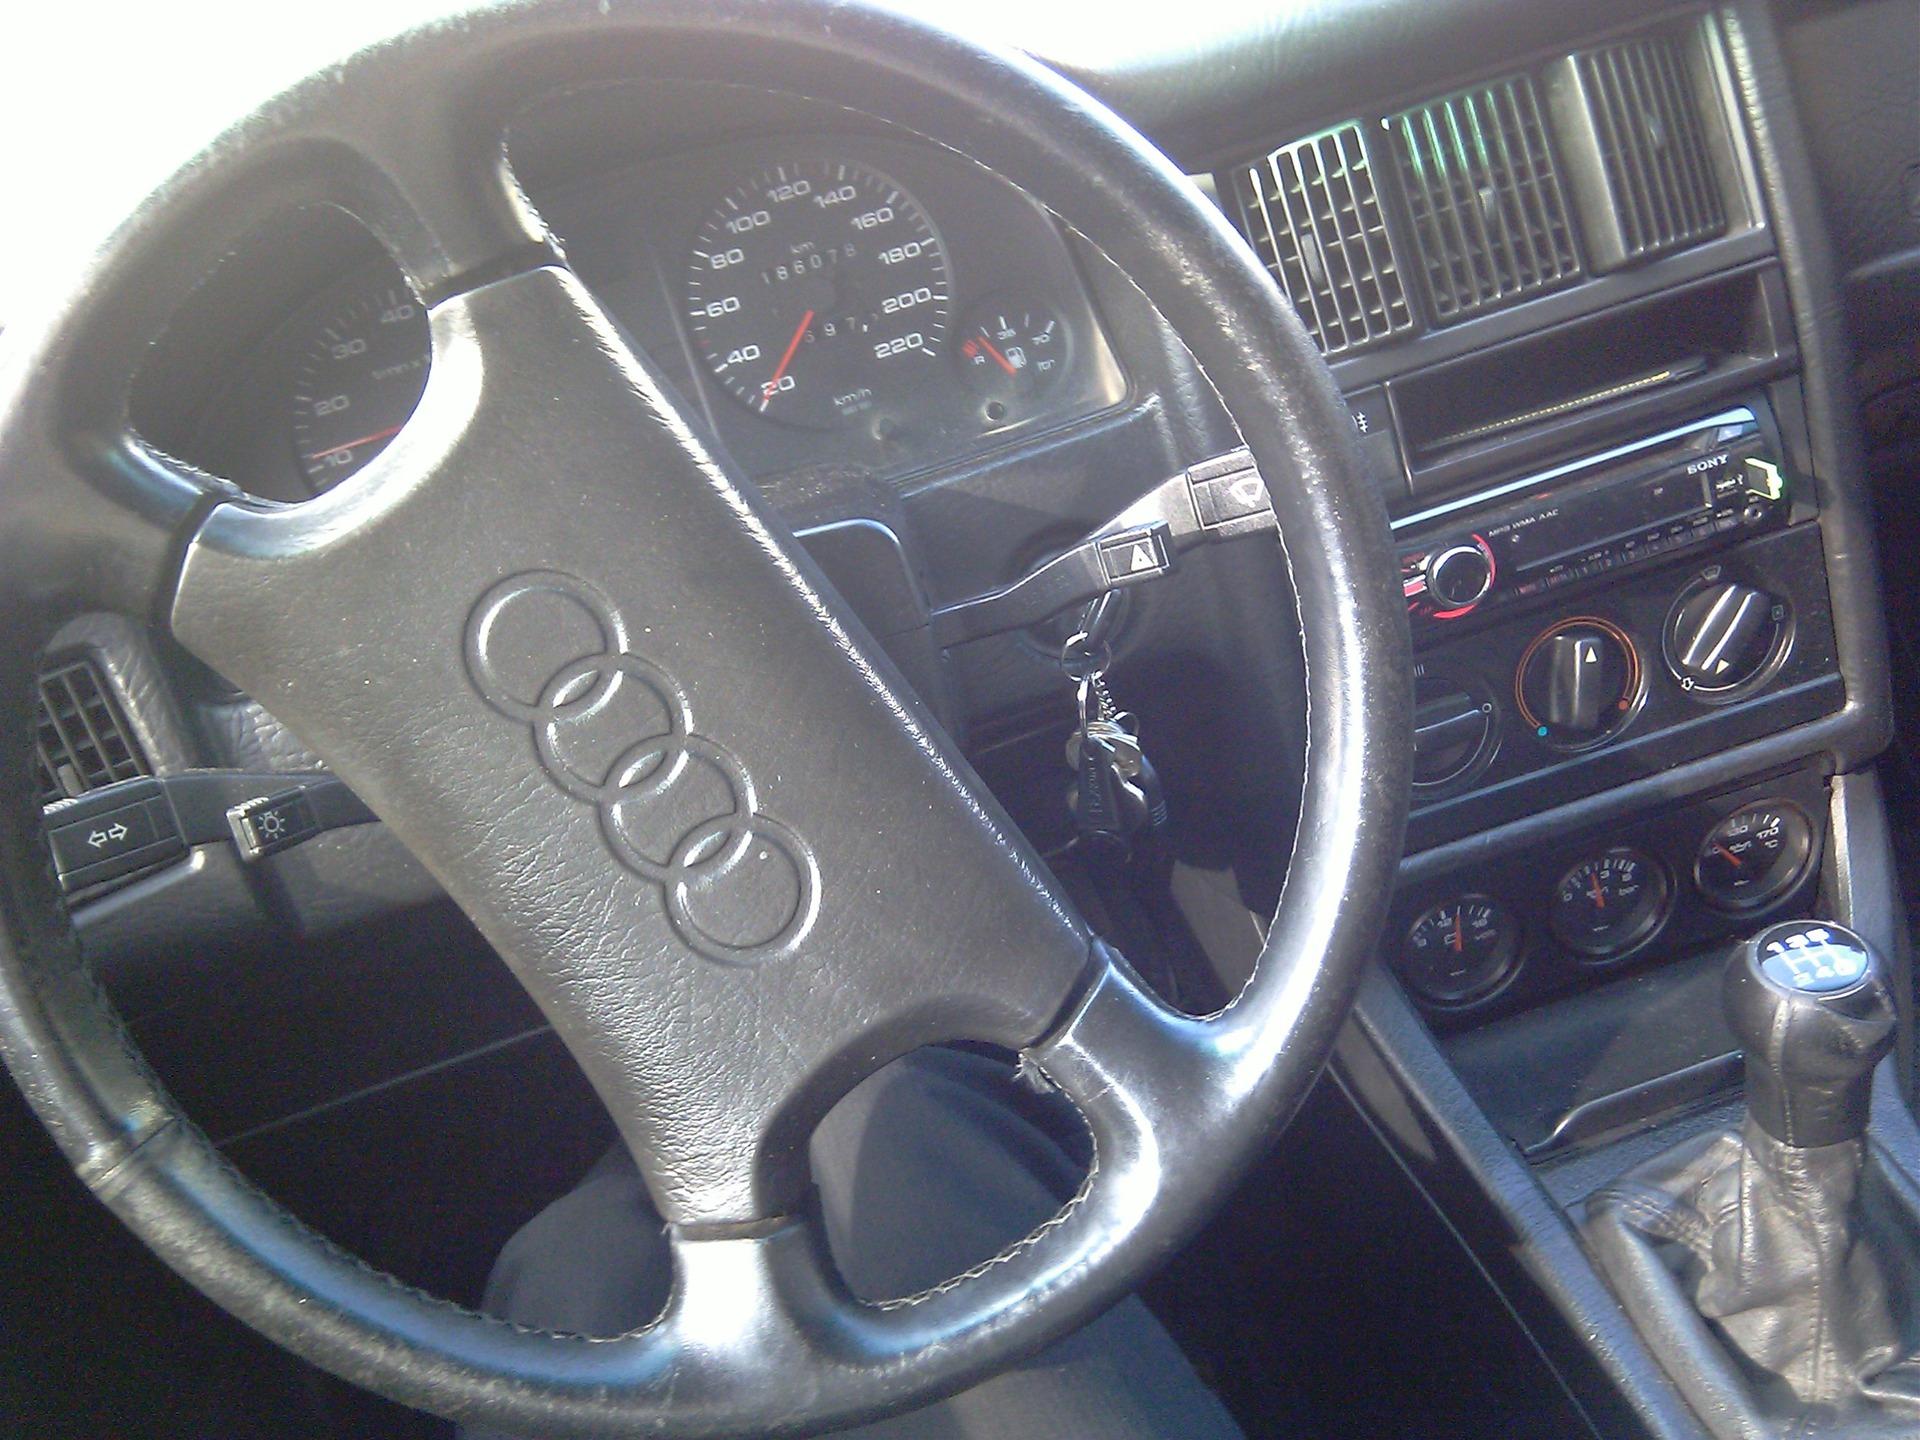 Перетяжка руля кожей - бортжурнал Audi 80 Exclusive Edition 1989 года на DRIVE2